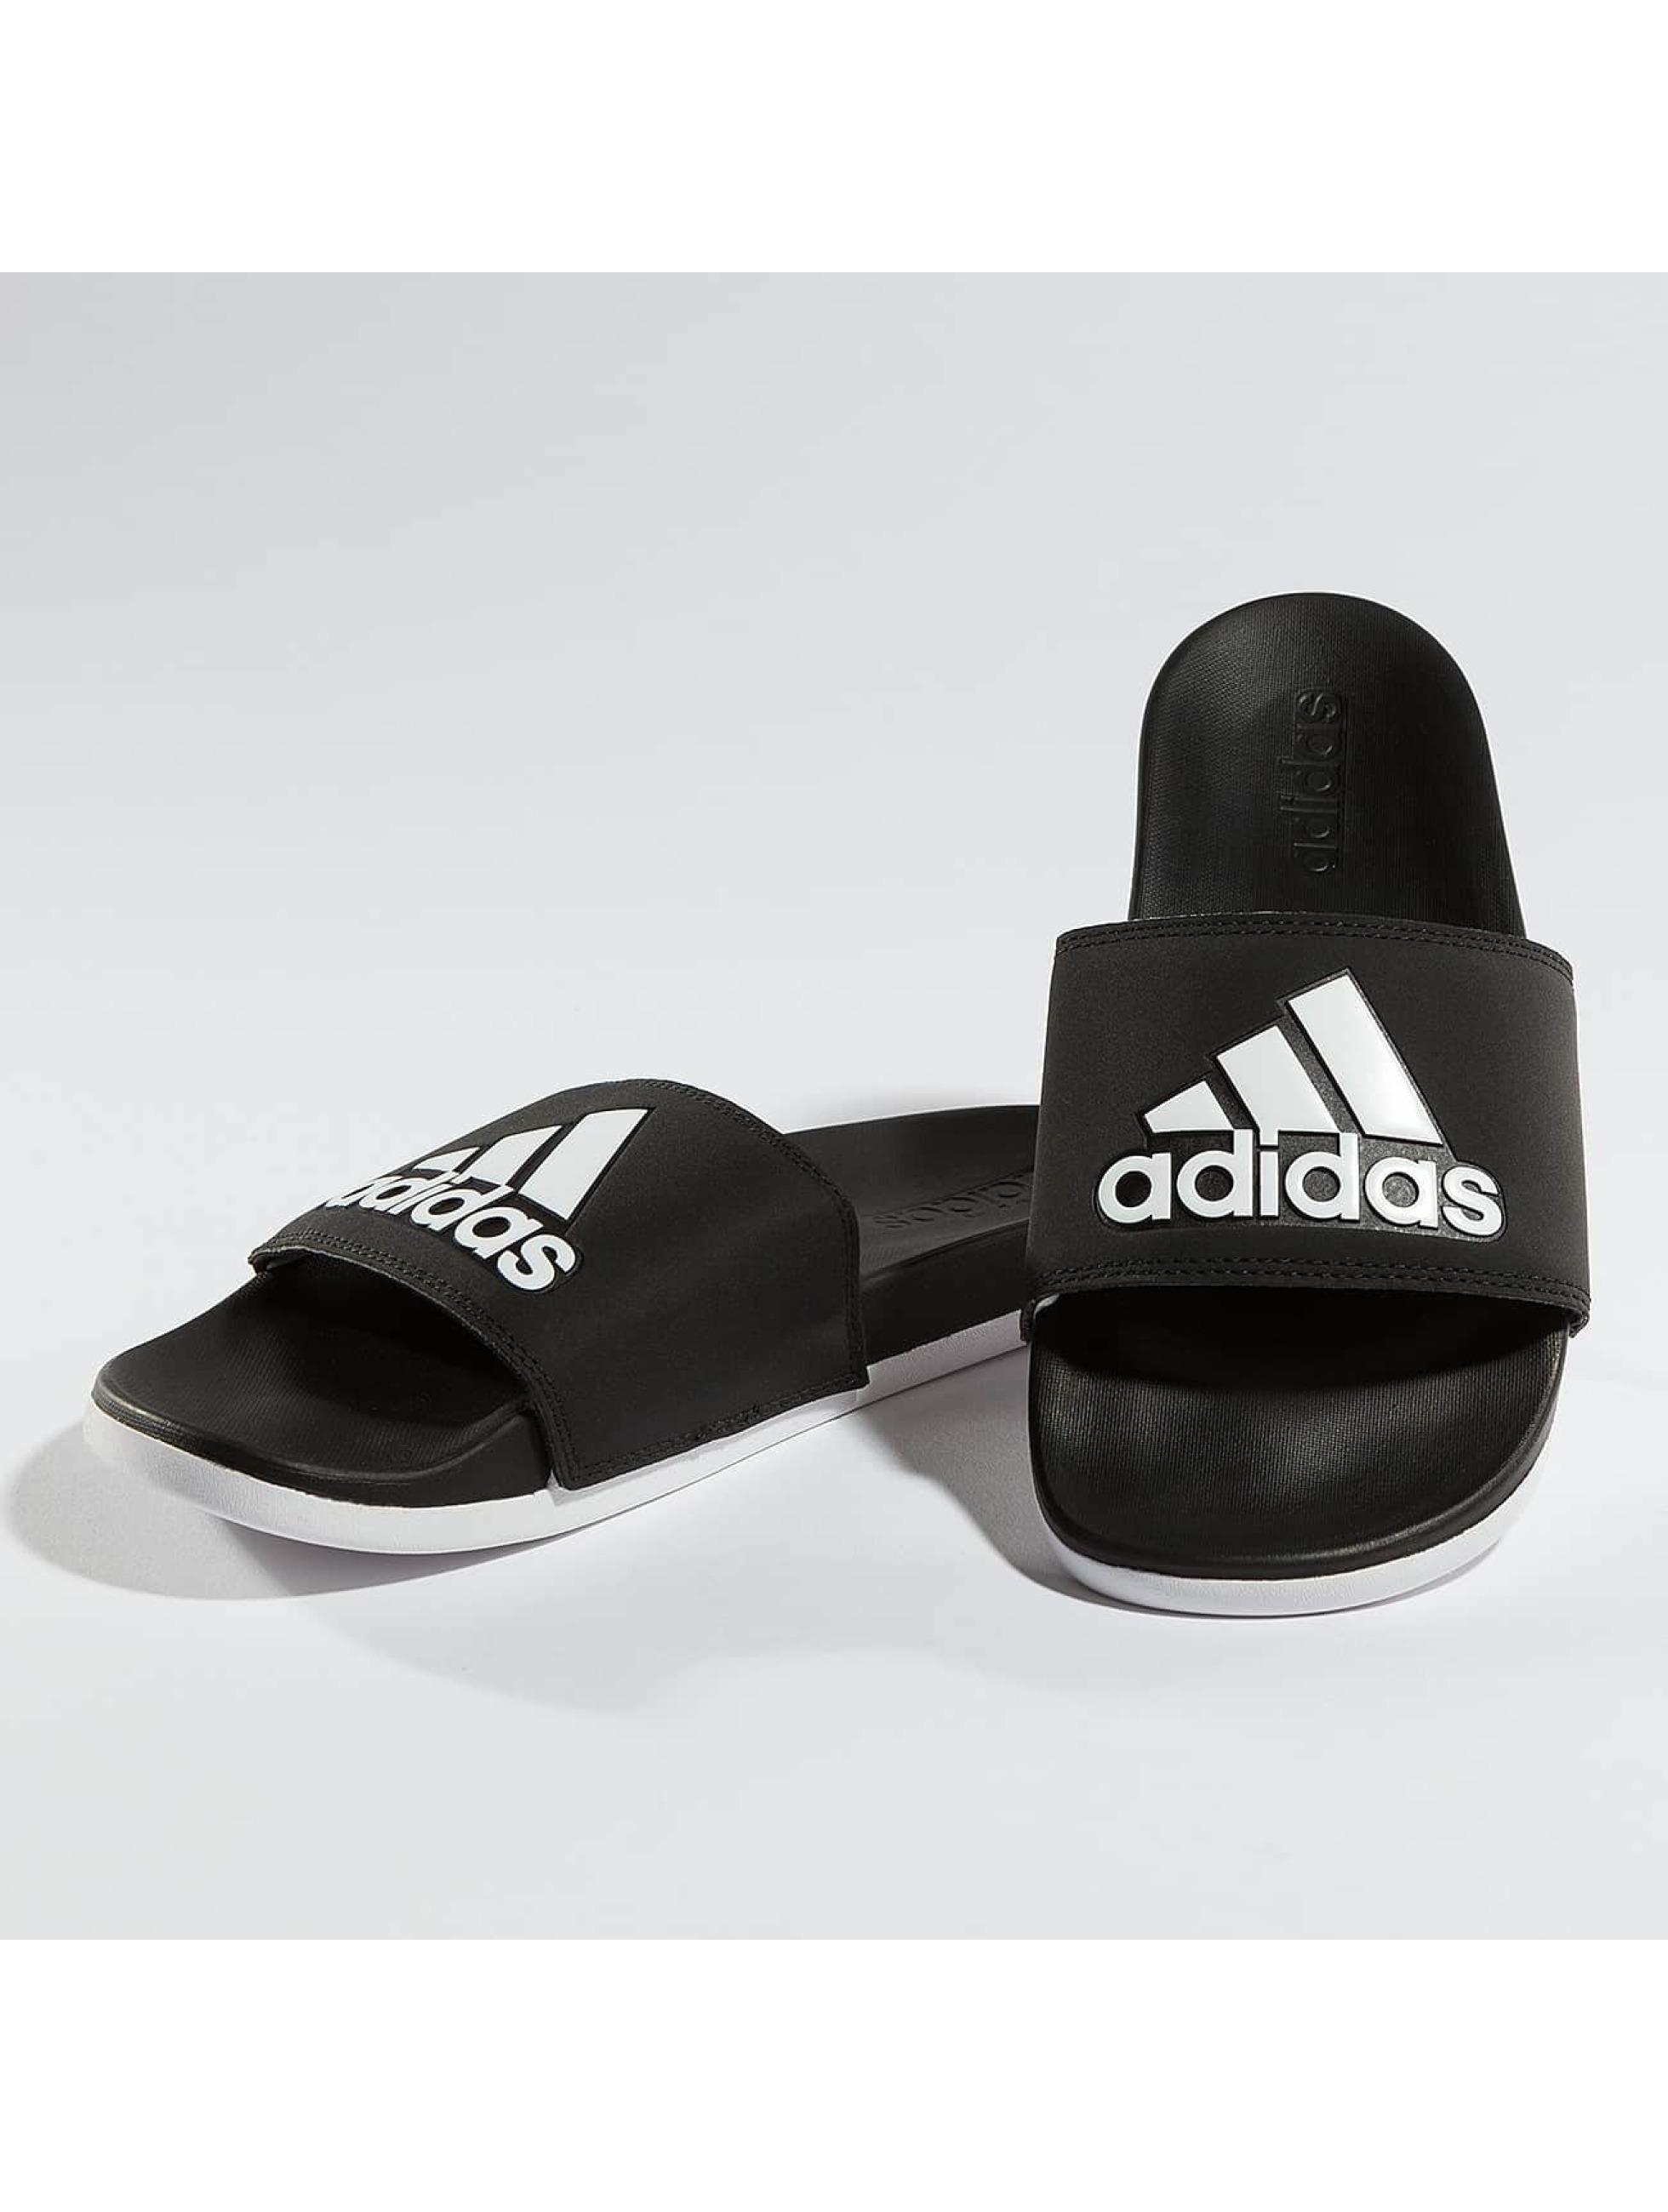 adidas Performance Claquettes & Sandales Adilette Comfort noir